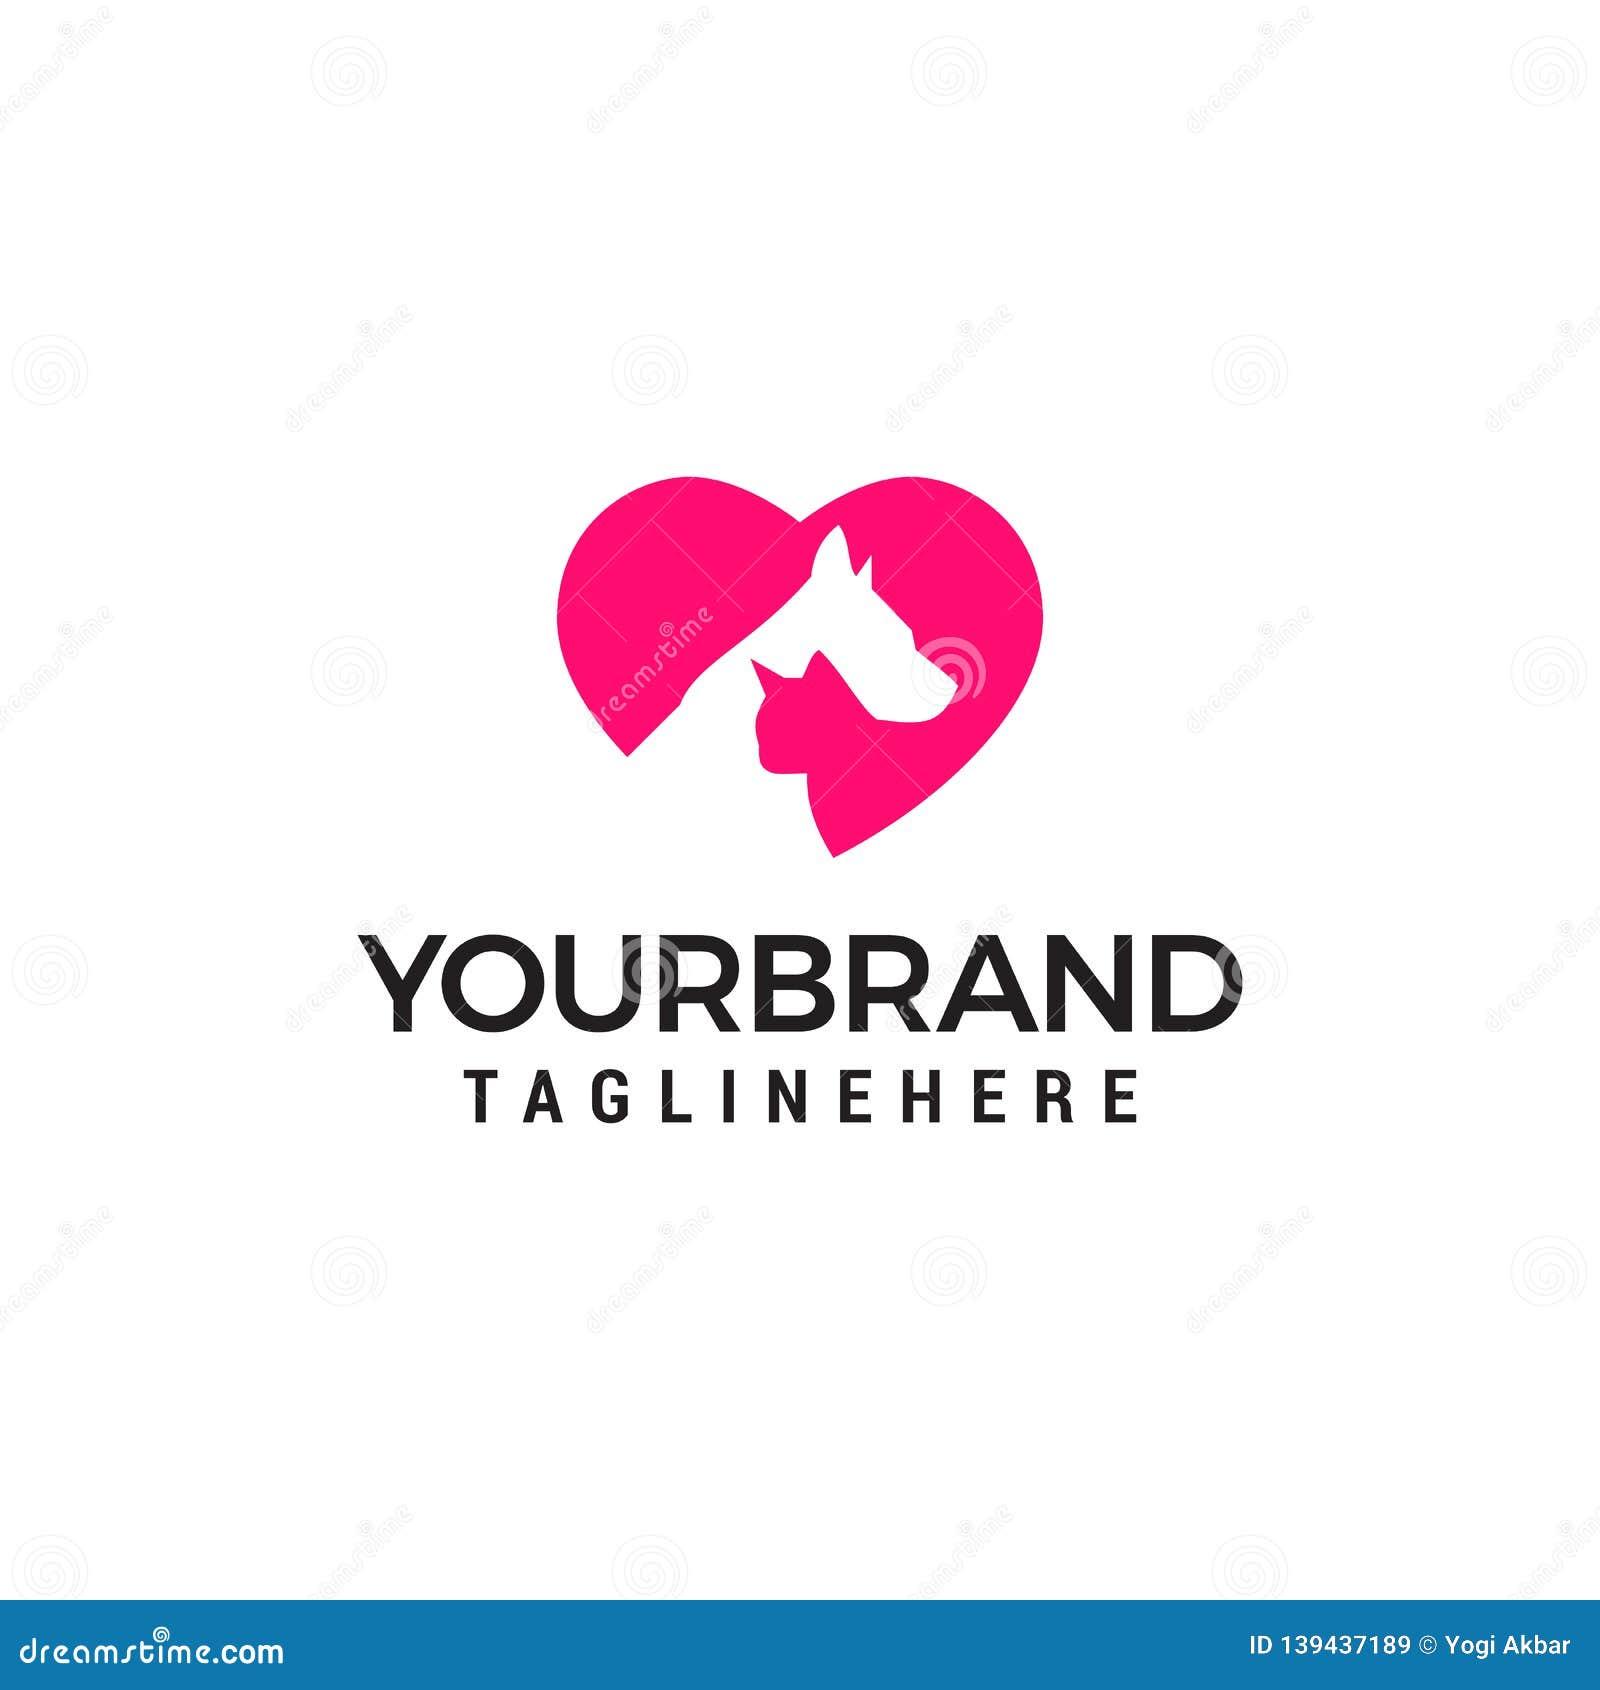 Modern Pet Logo - Love Dog cat logo. Love animal logo design concept